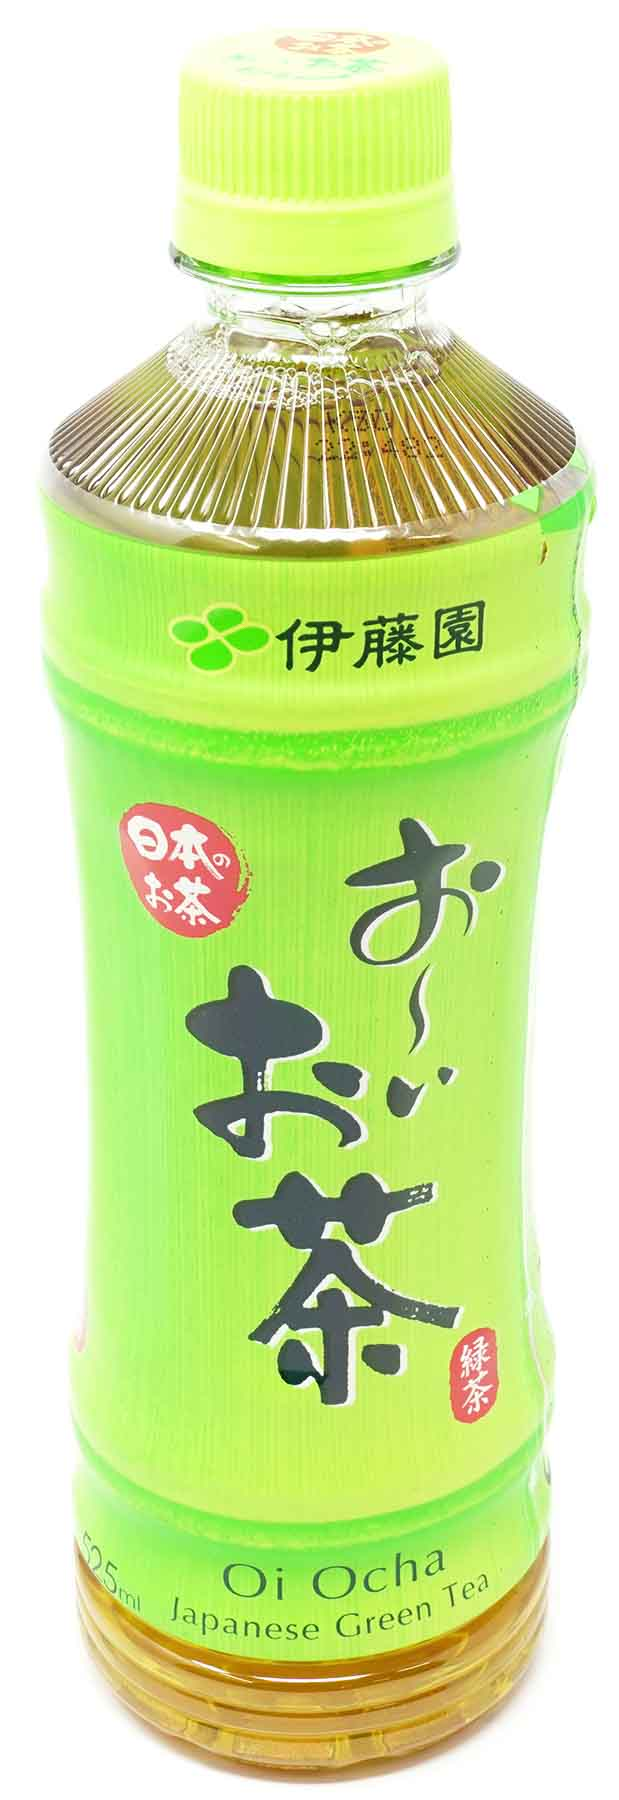 ITOEN Oi Ocha Ryokucha, 525 ml